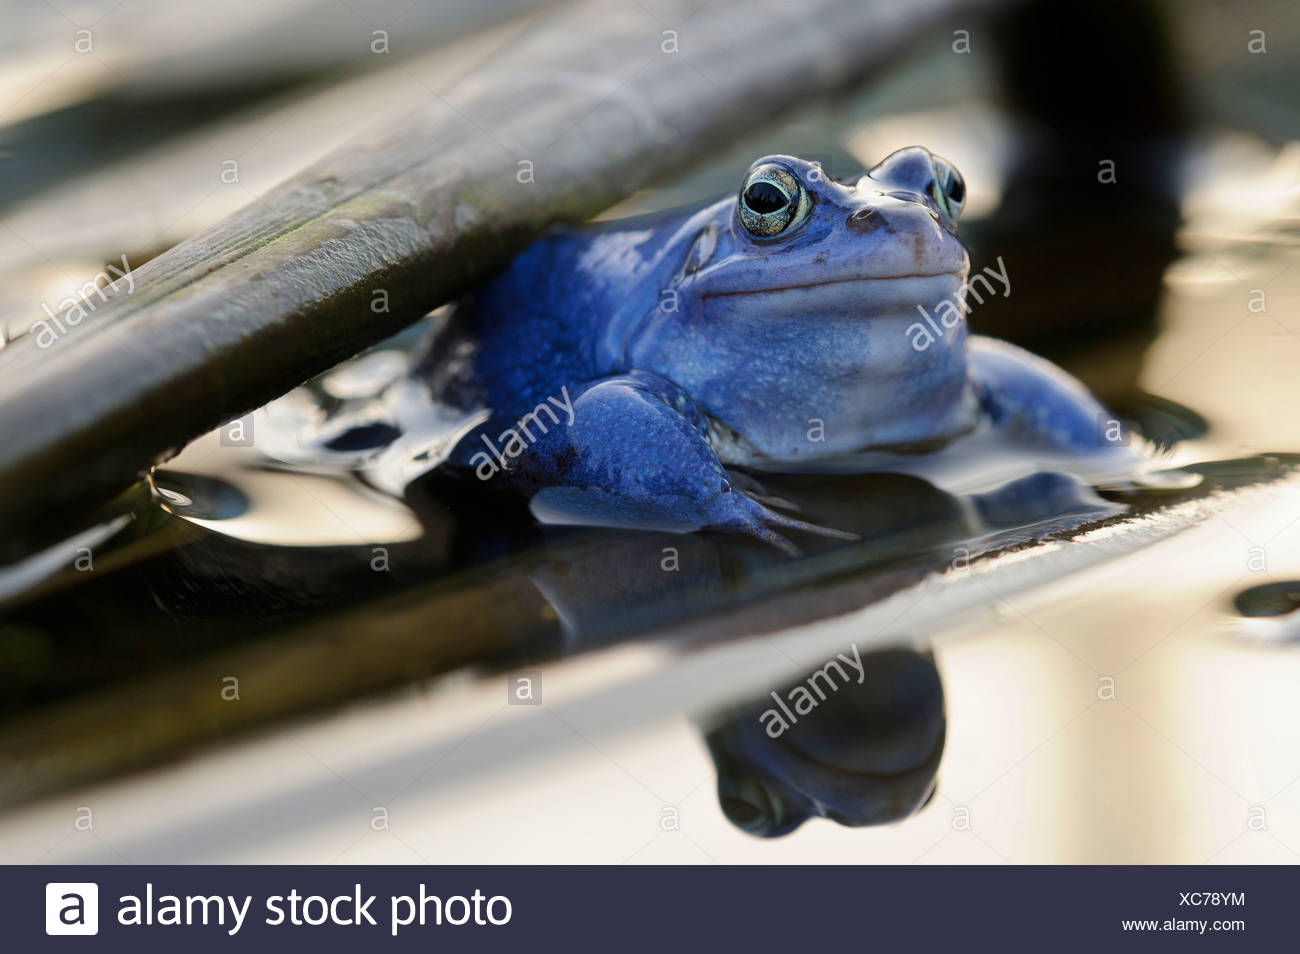 moor frog, male at mating season, rana arvalis, lower saxony, germany - Stock Image